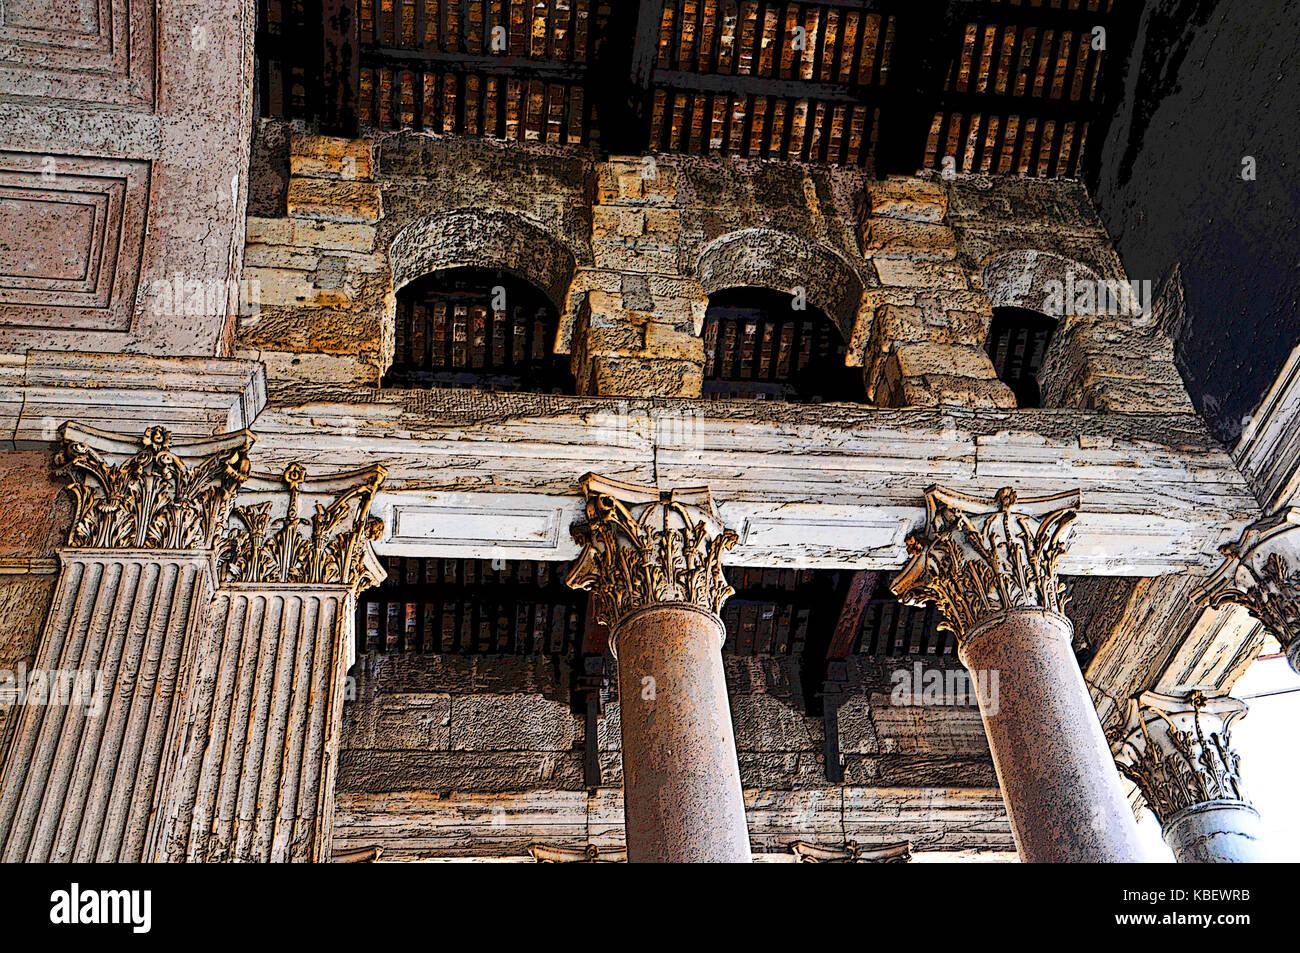 The Pantheon Corinthian Columns, Rome, Italy - Stock Image